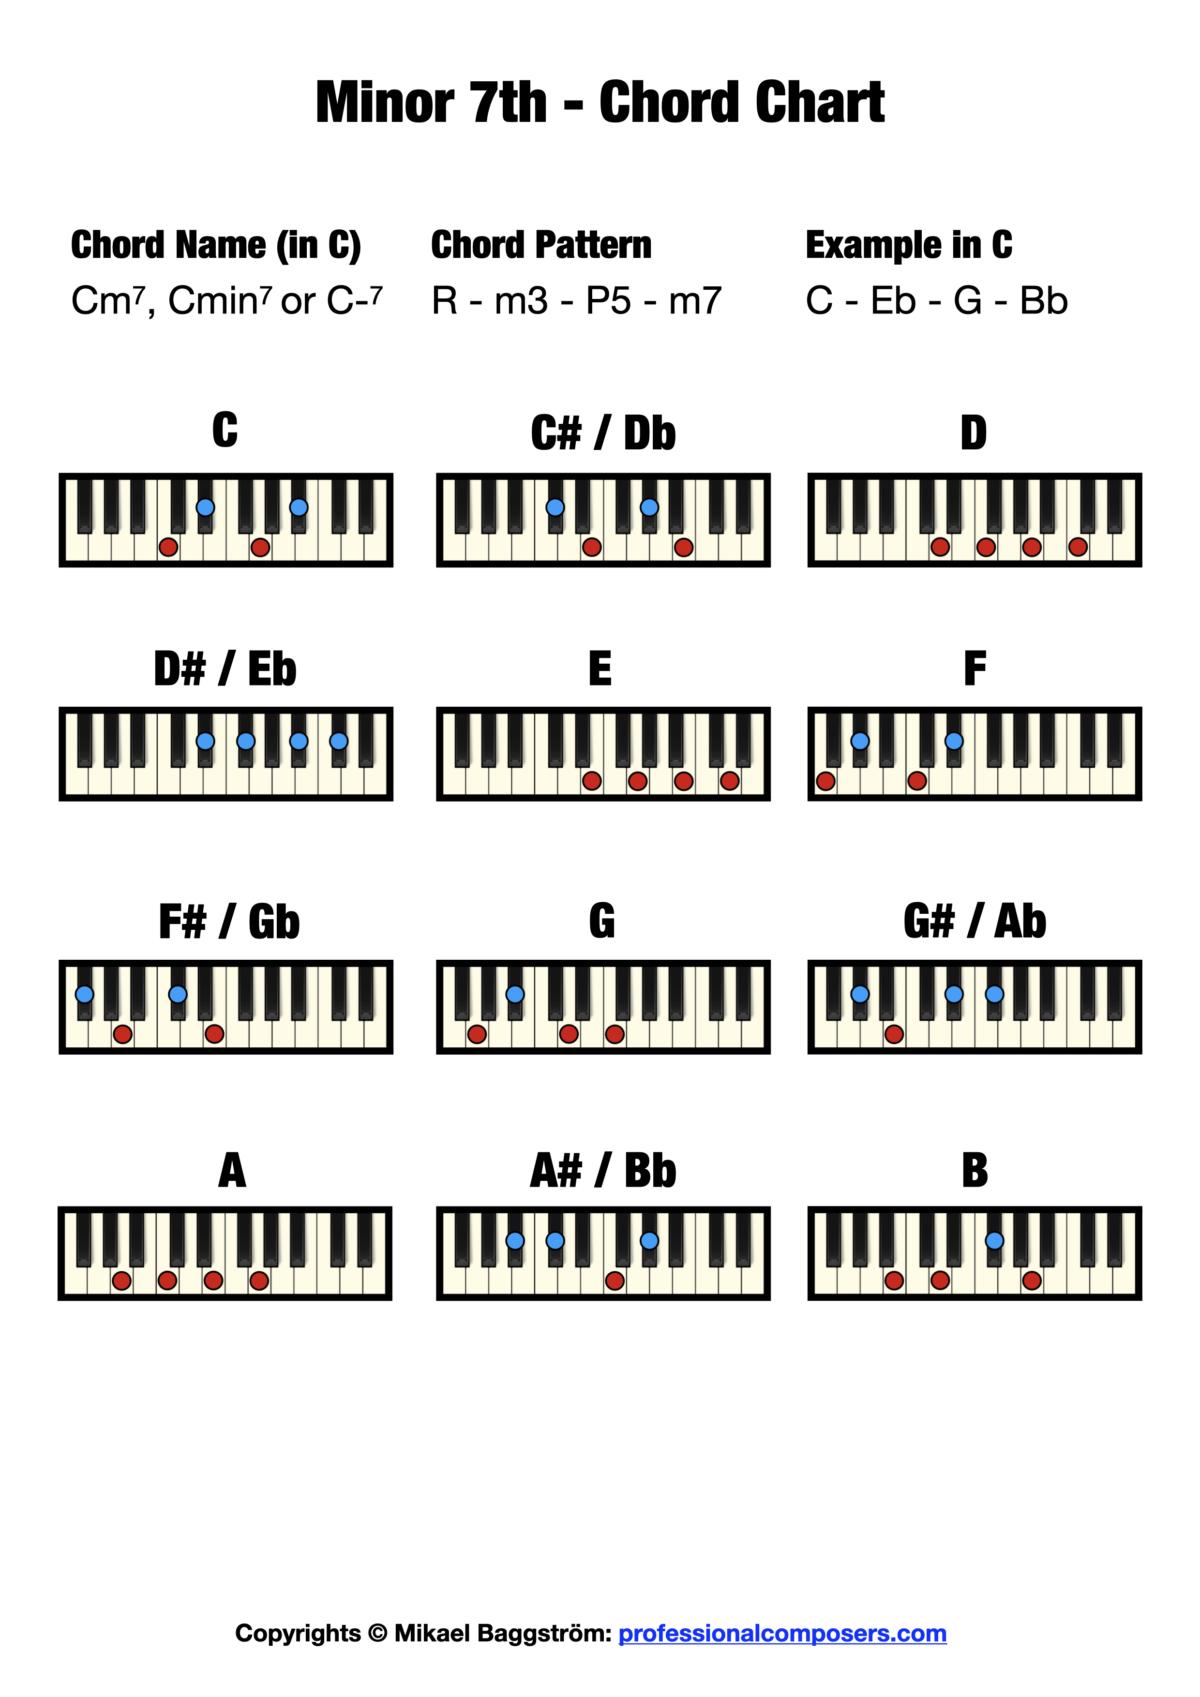 Minor 7th Chord Chart on Piano